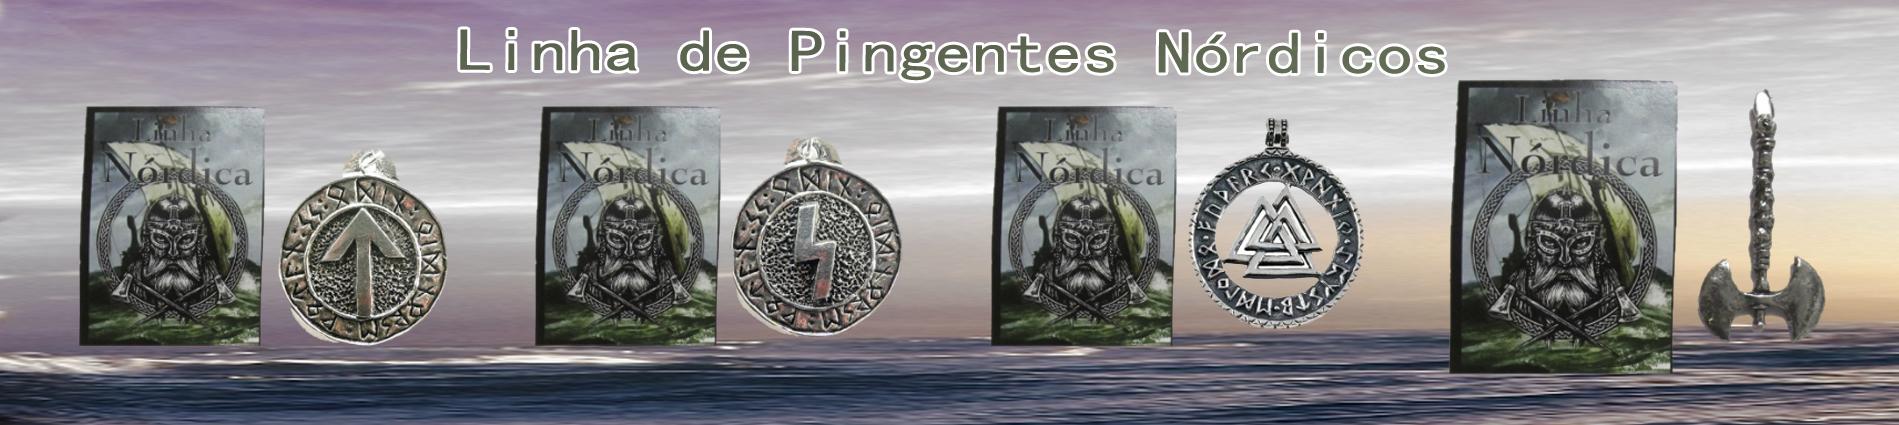 https://cdn.brasilesoterico.com/imagens_banners/086c81220cd432ddd7f70aeb175927ea.jpg